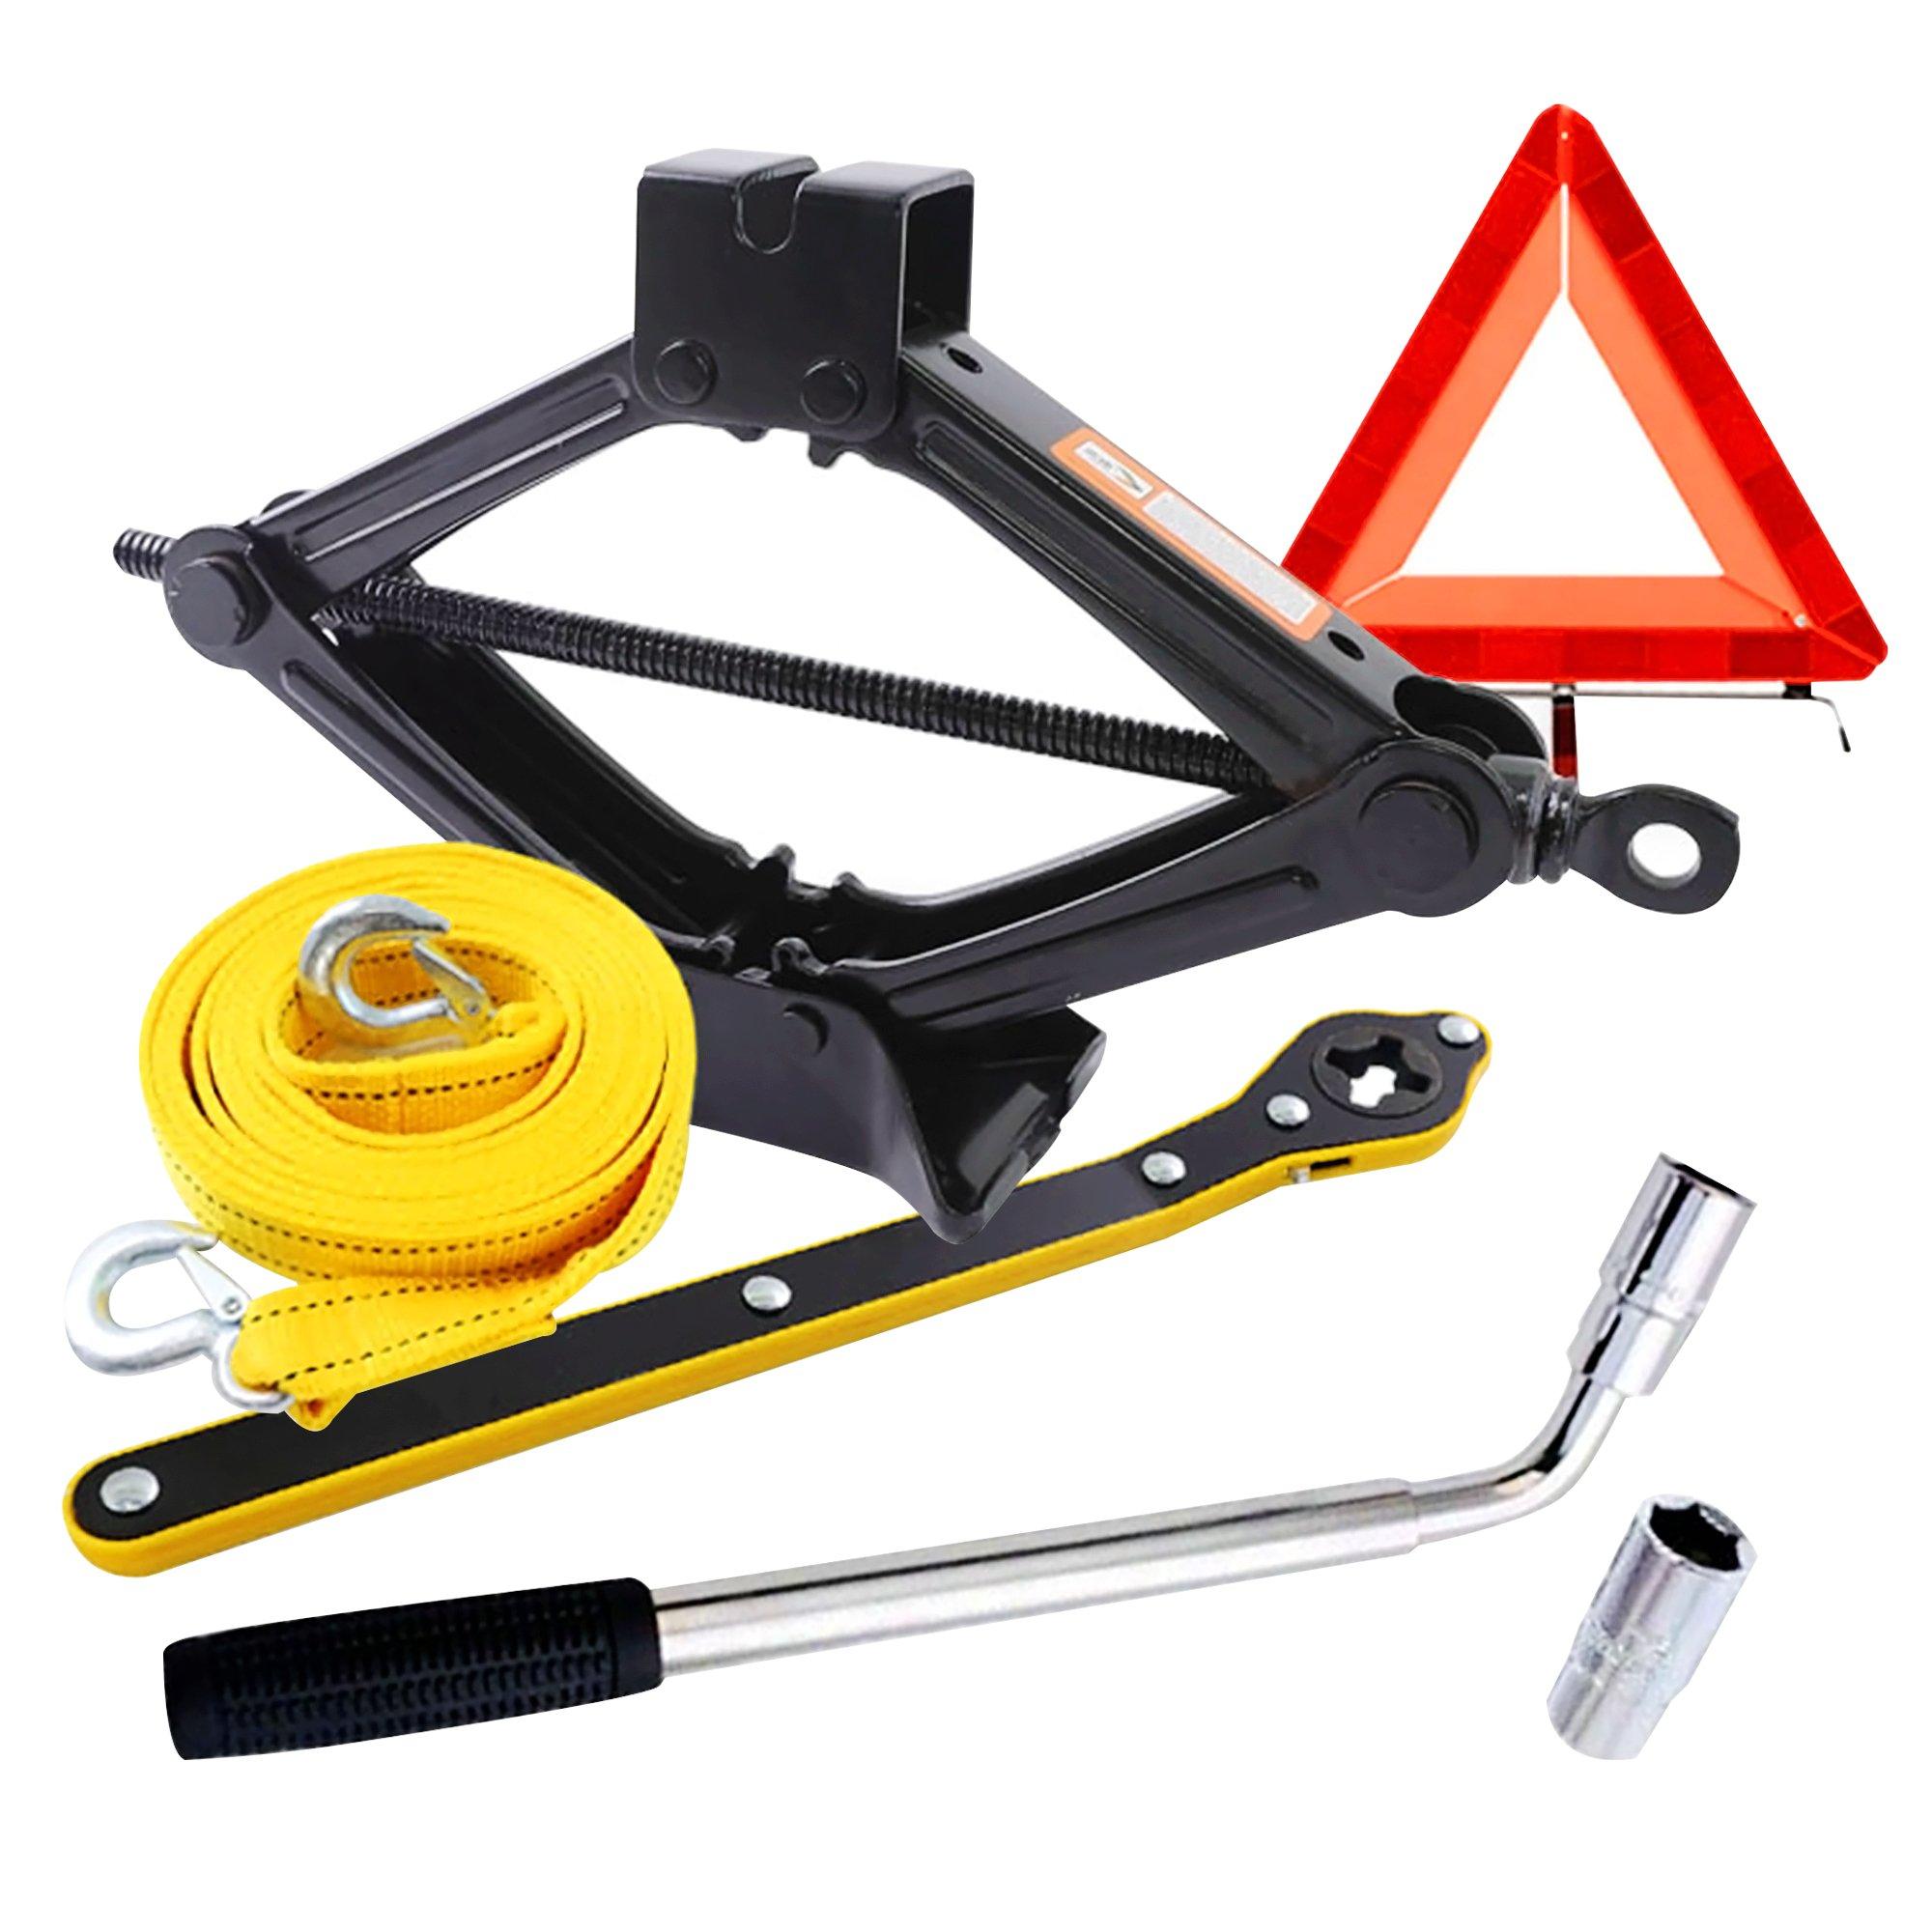 Emergency Car Jack Towing Rope Safety Set - 1.5 Ton